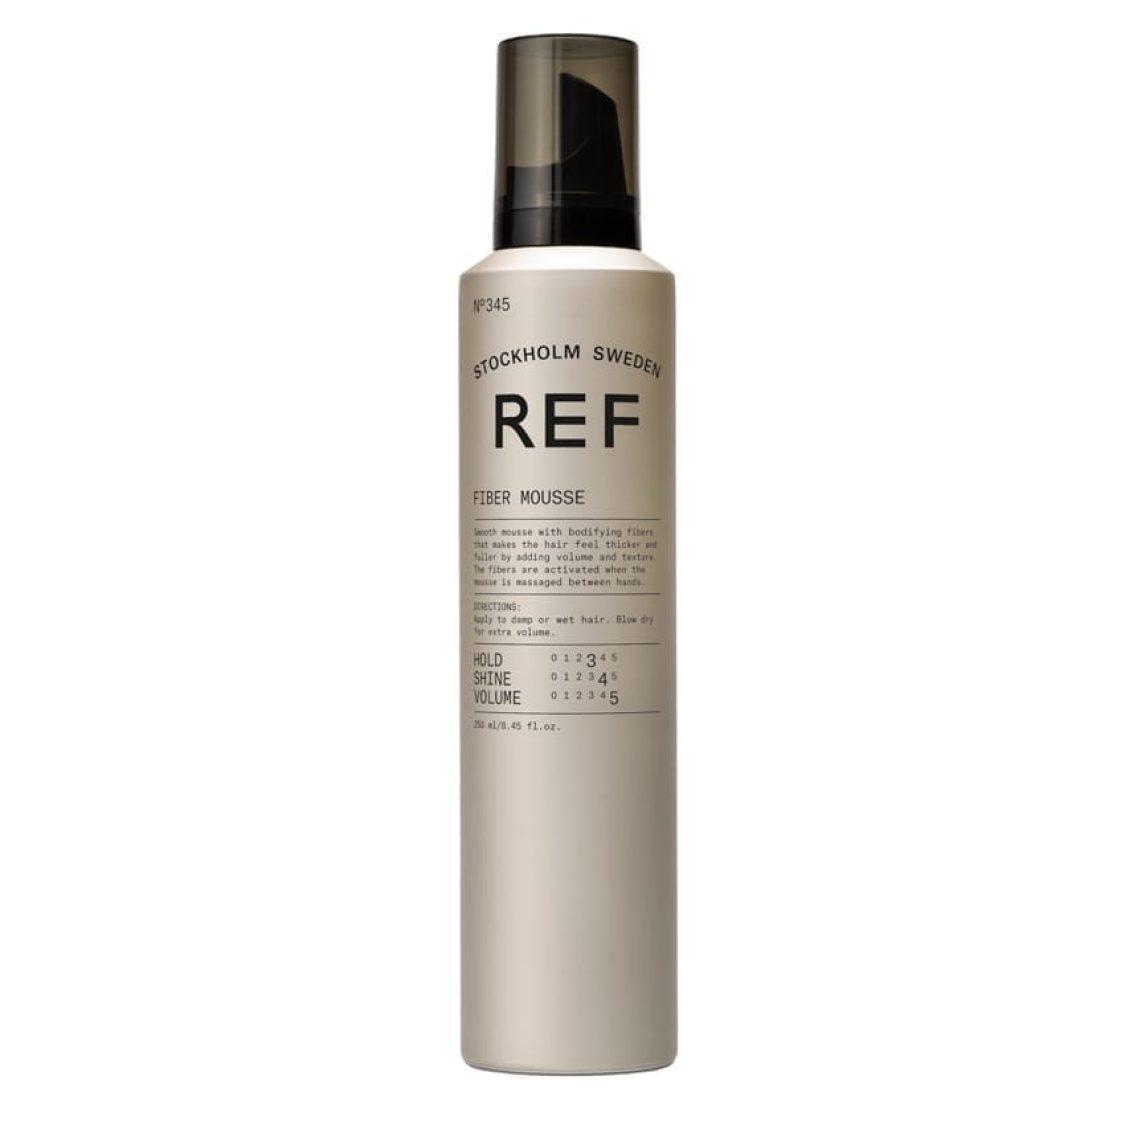 REF - Fiber Mousse 250ml